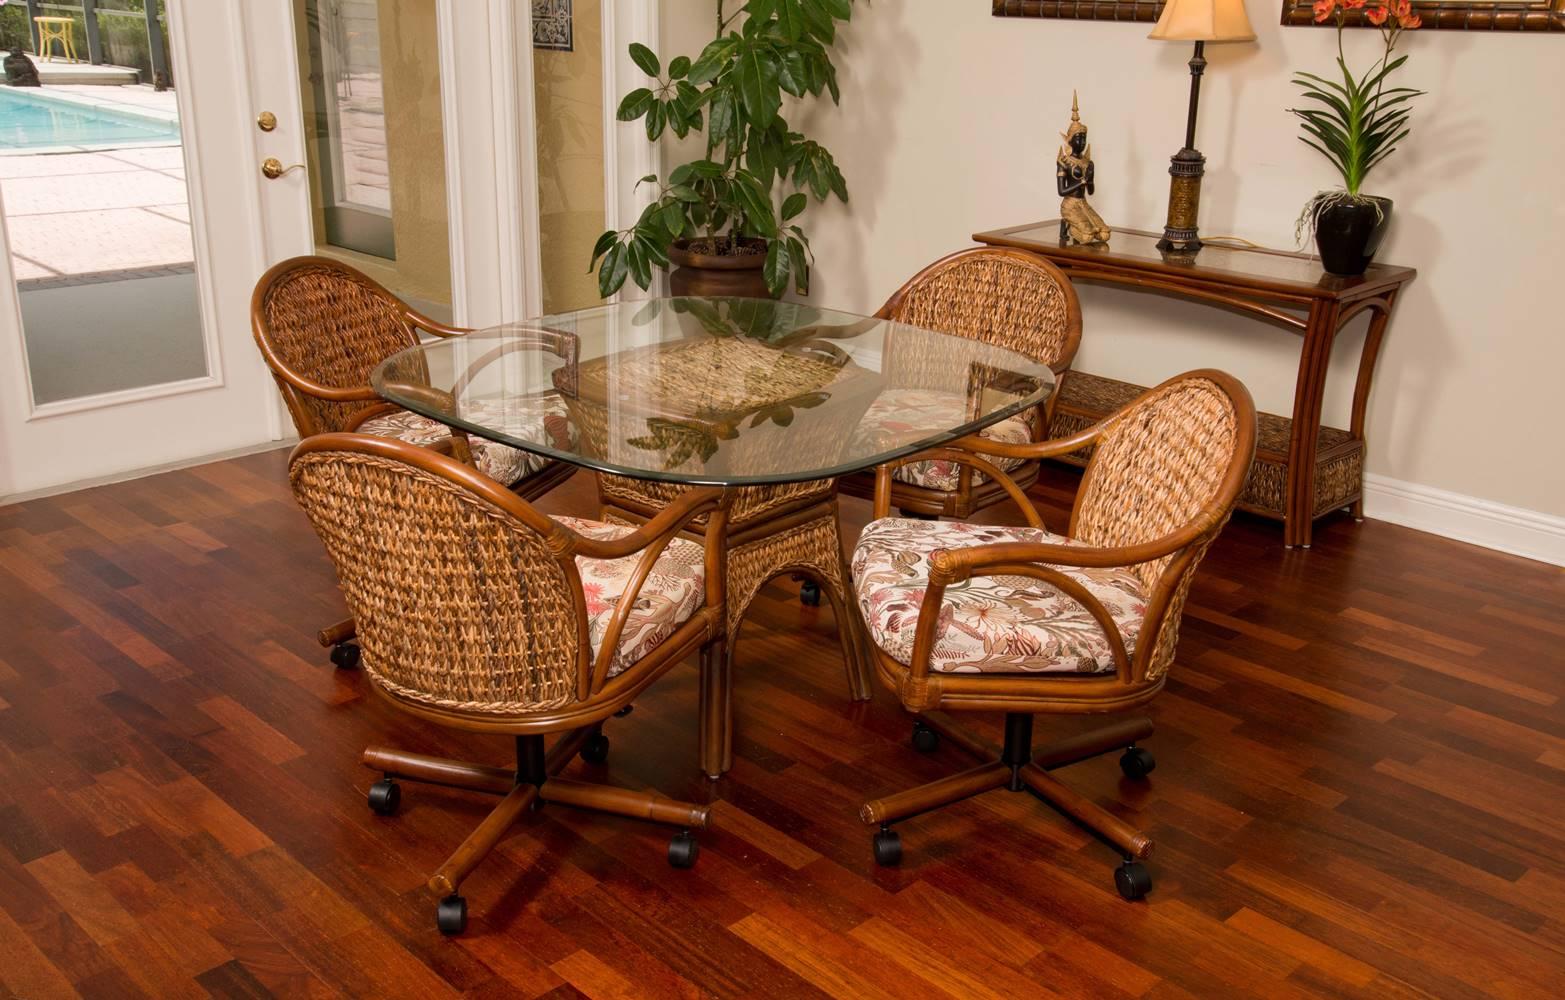 Panama Tilt Swivel Caster Chair Sienna Finish